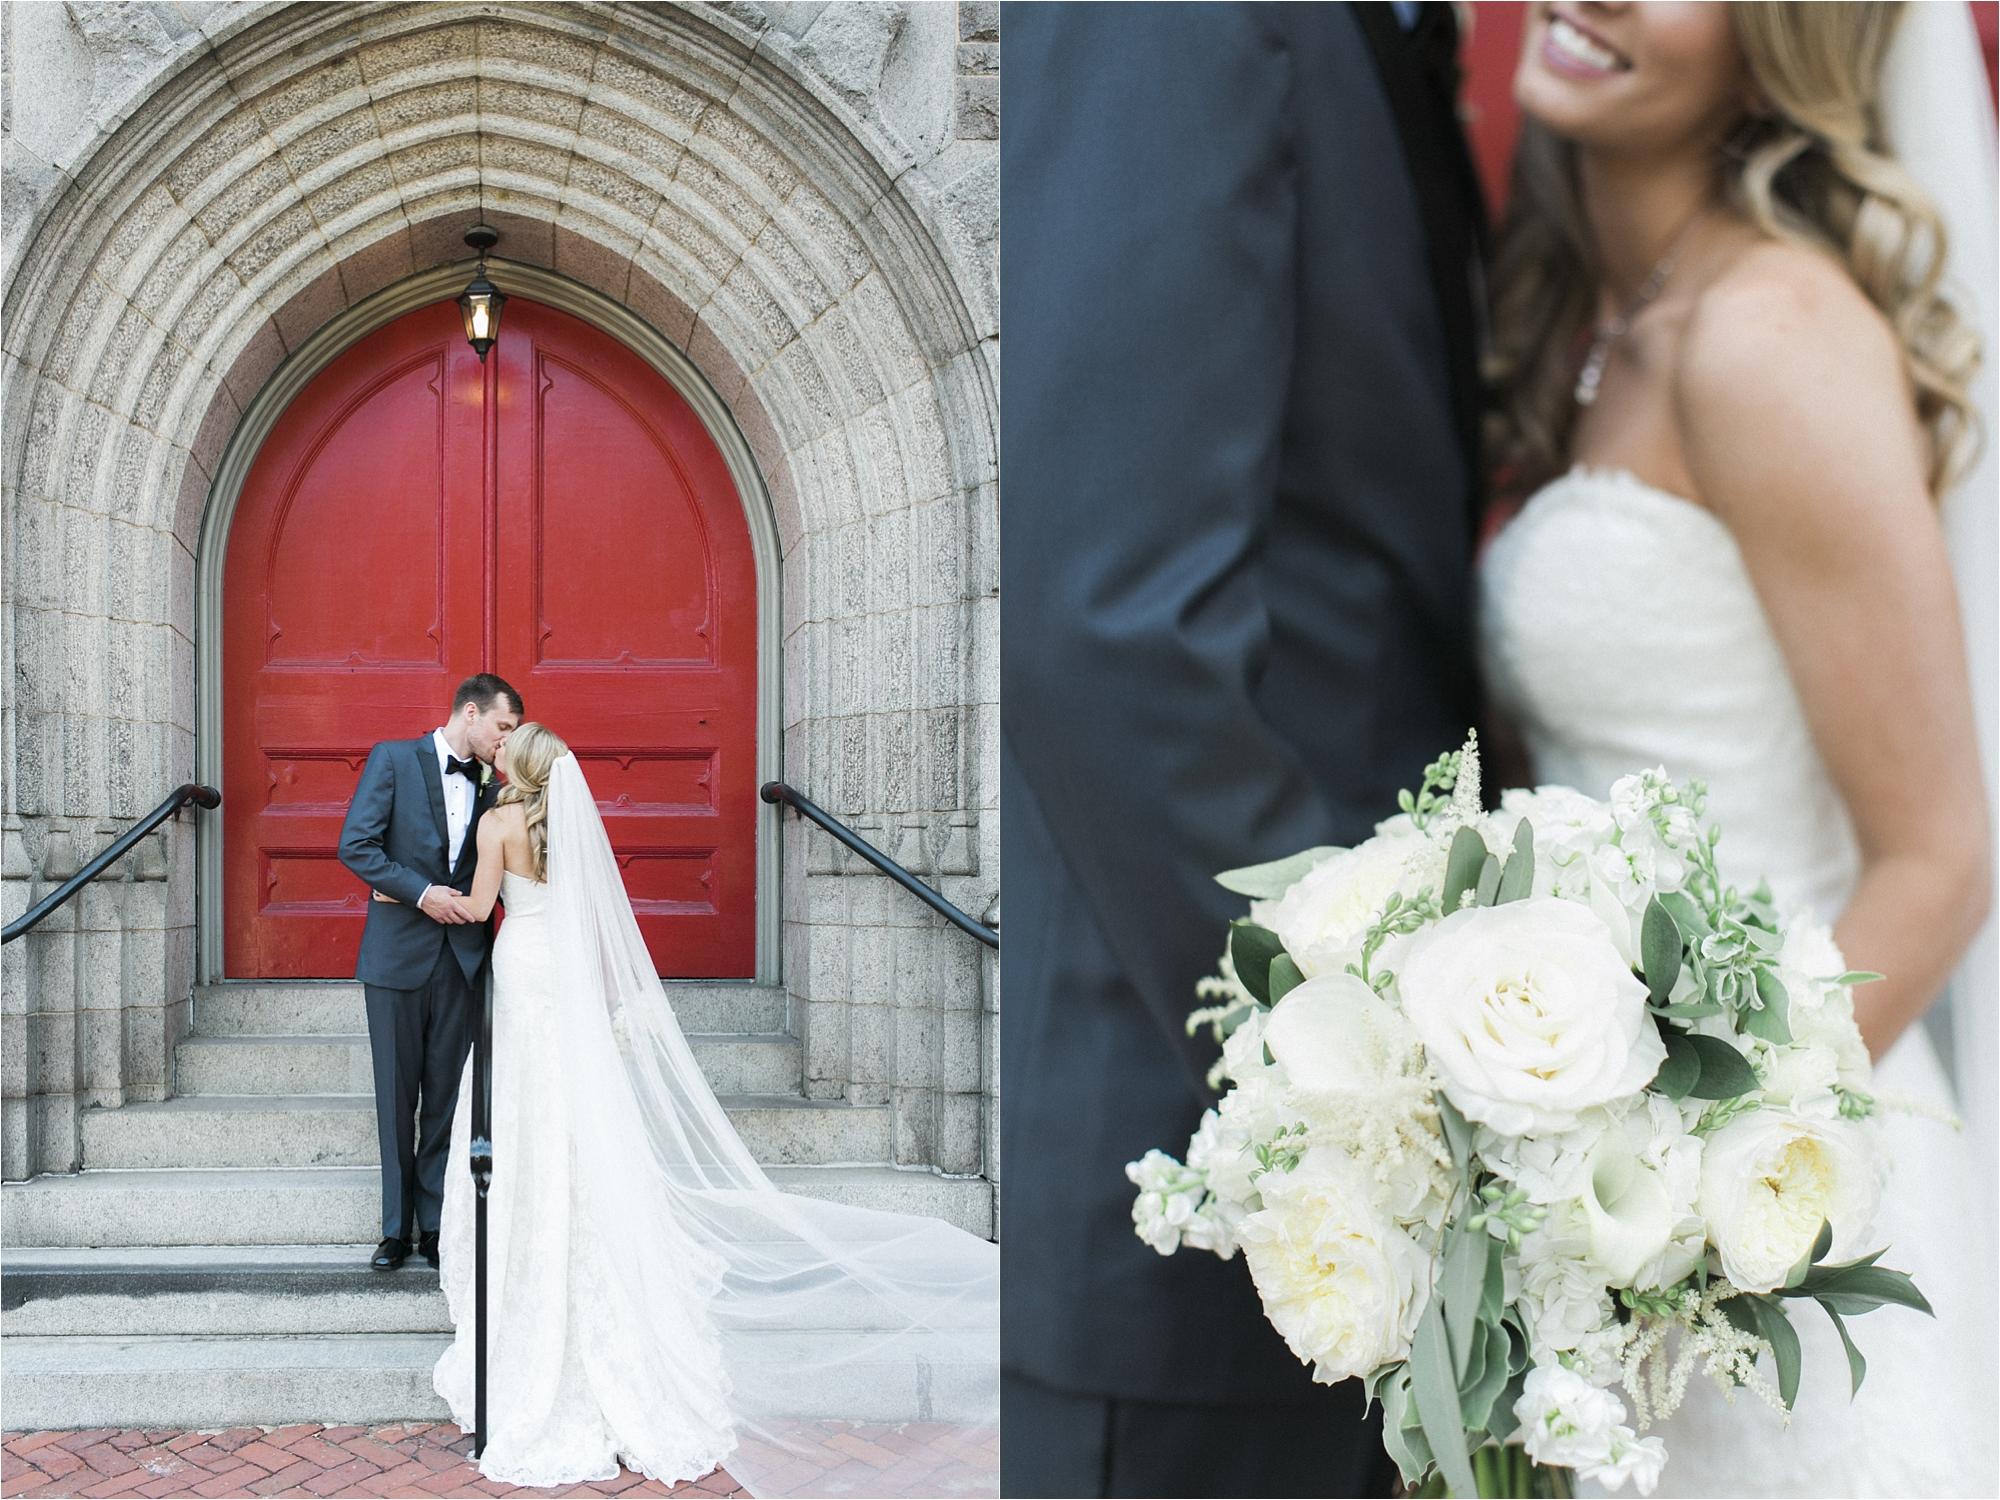 stephanie-yonce-photography-richmond-virginia-country-club-wedding_0022.jpg